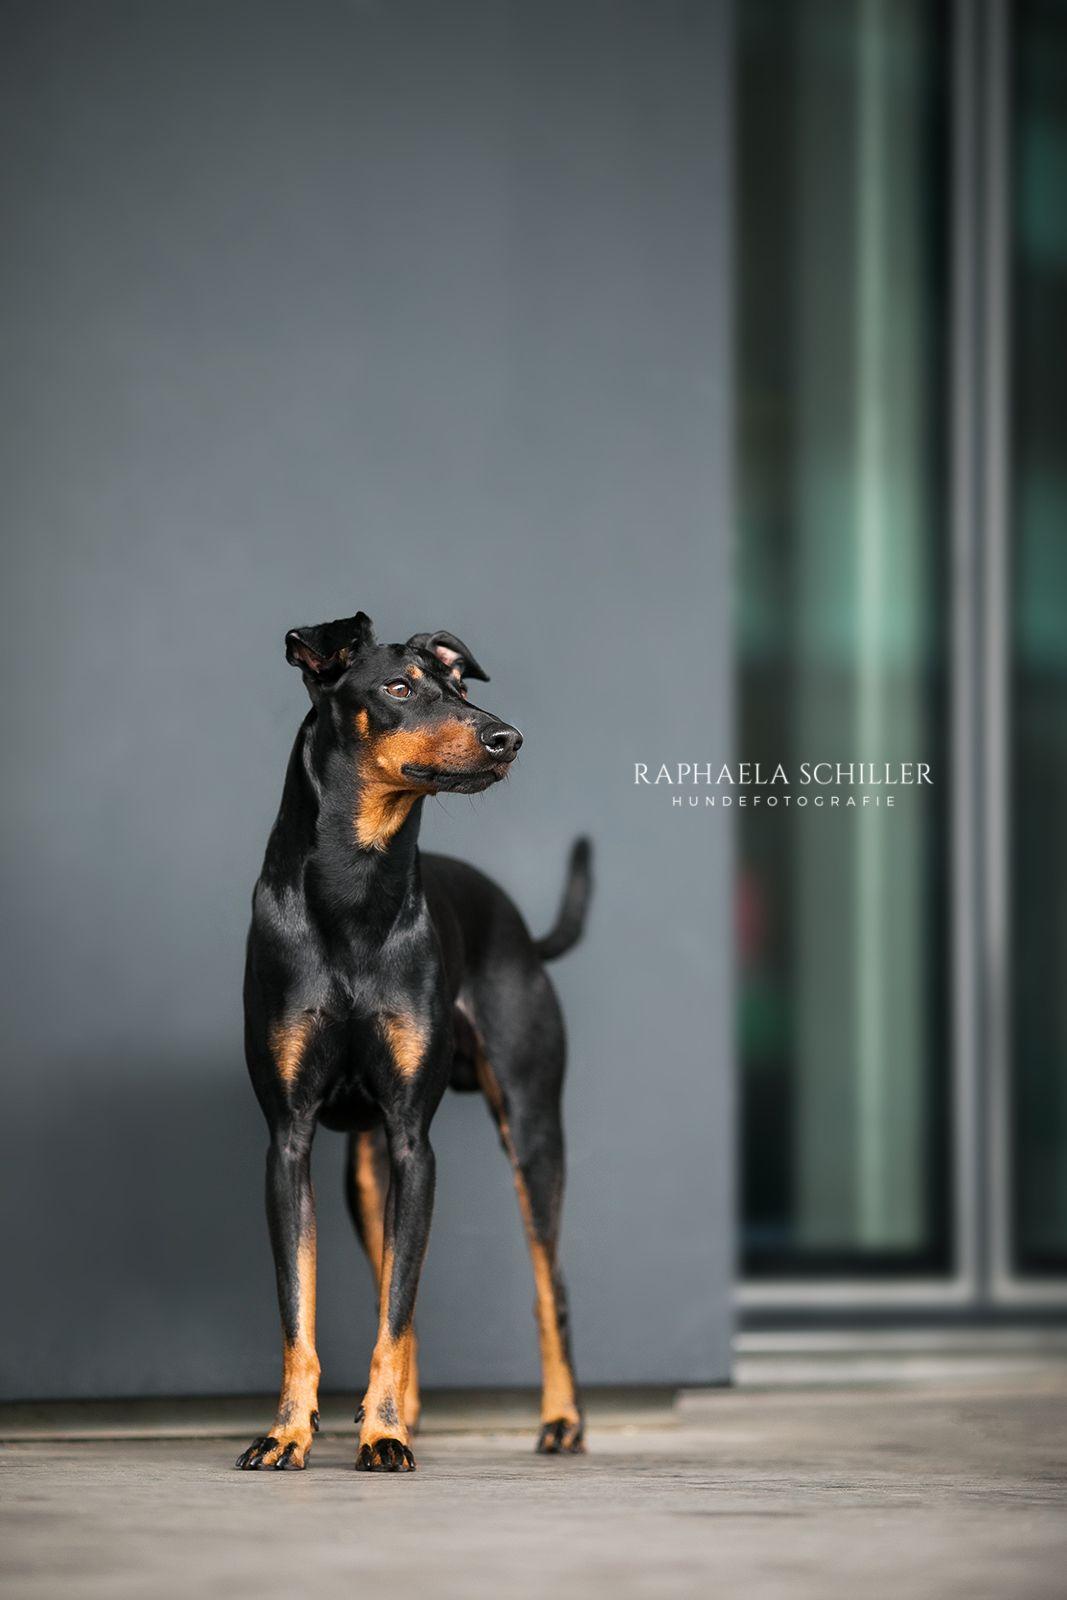 Hundefotografie Dog Photography Hundefotografie Fotografie Tierfotografie